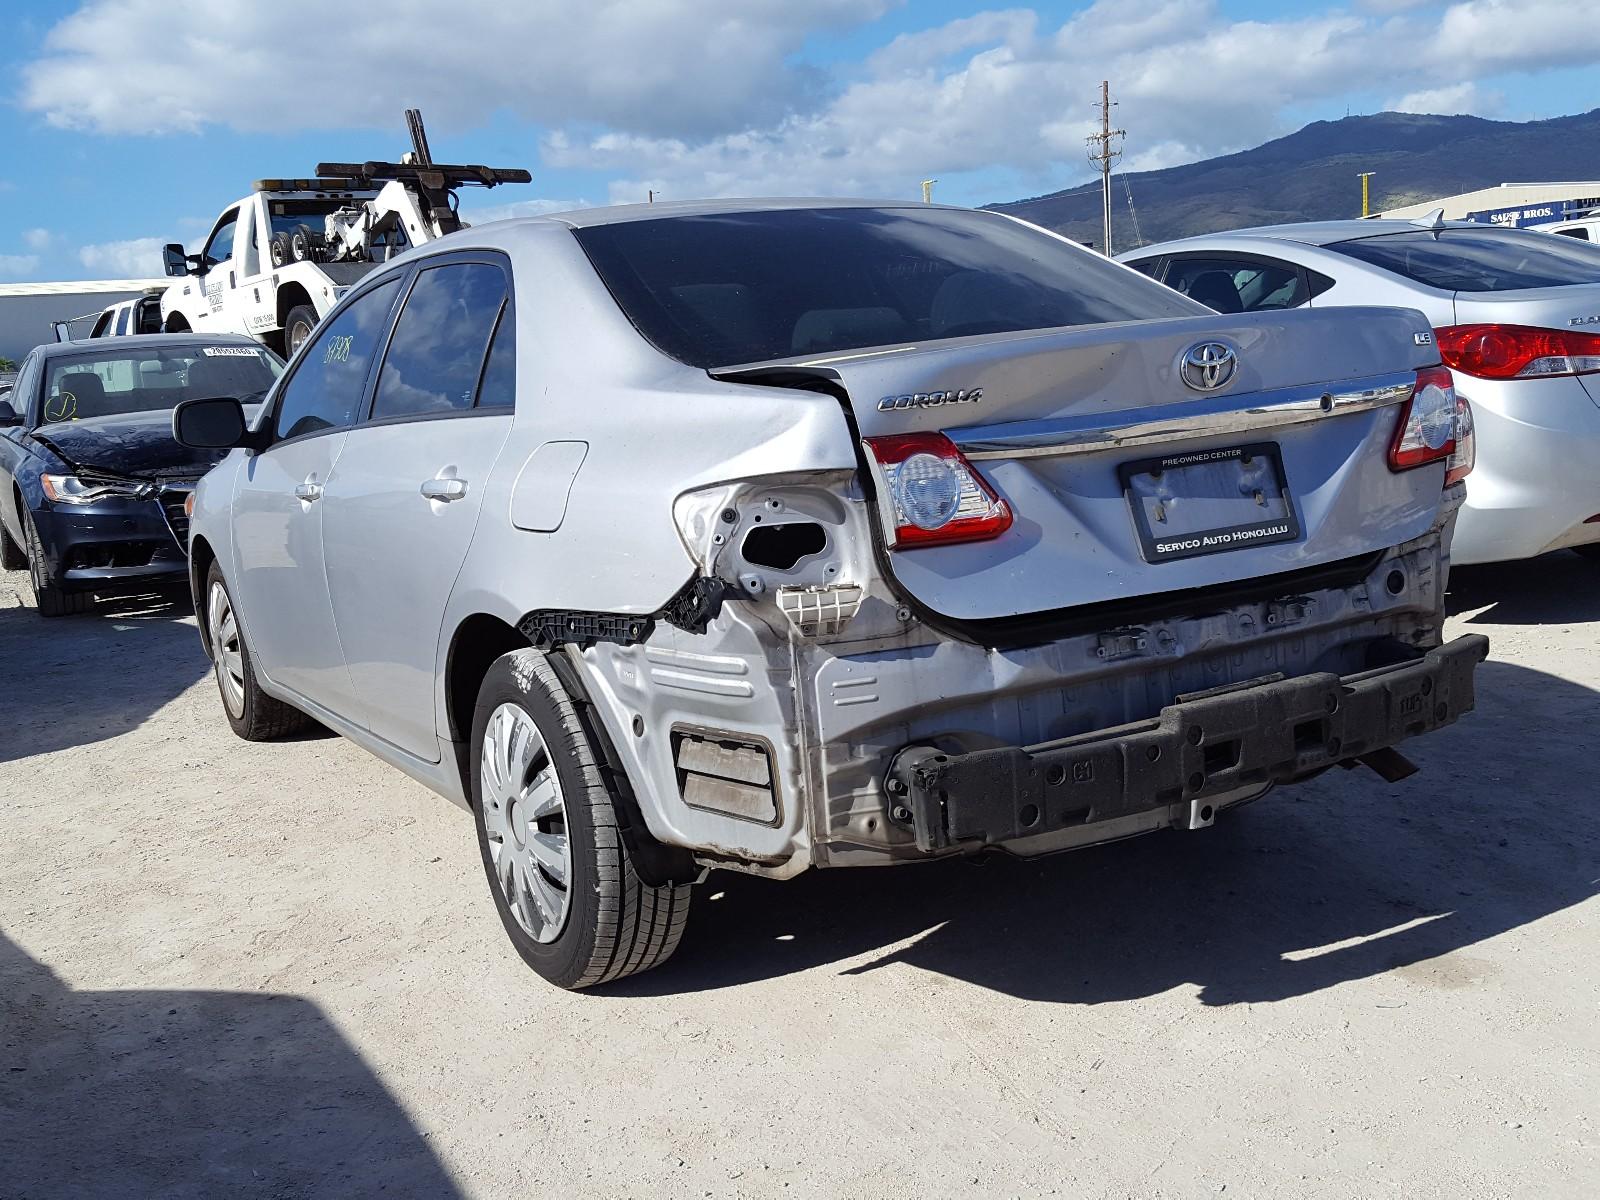 2T1BU4EE0CC763011 - 2012 Toyota Corolla Ba 1.8L [Angle] View